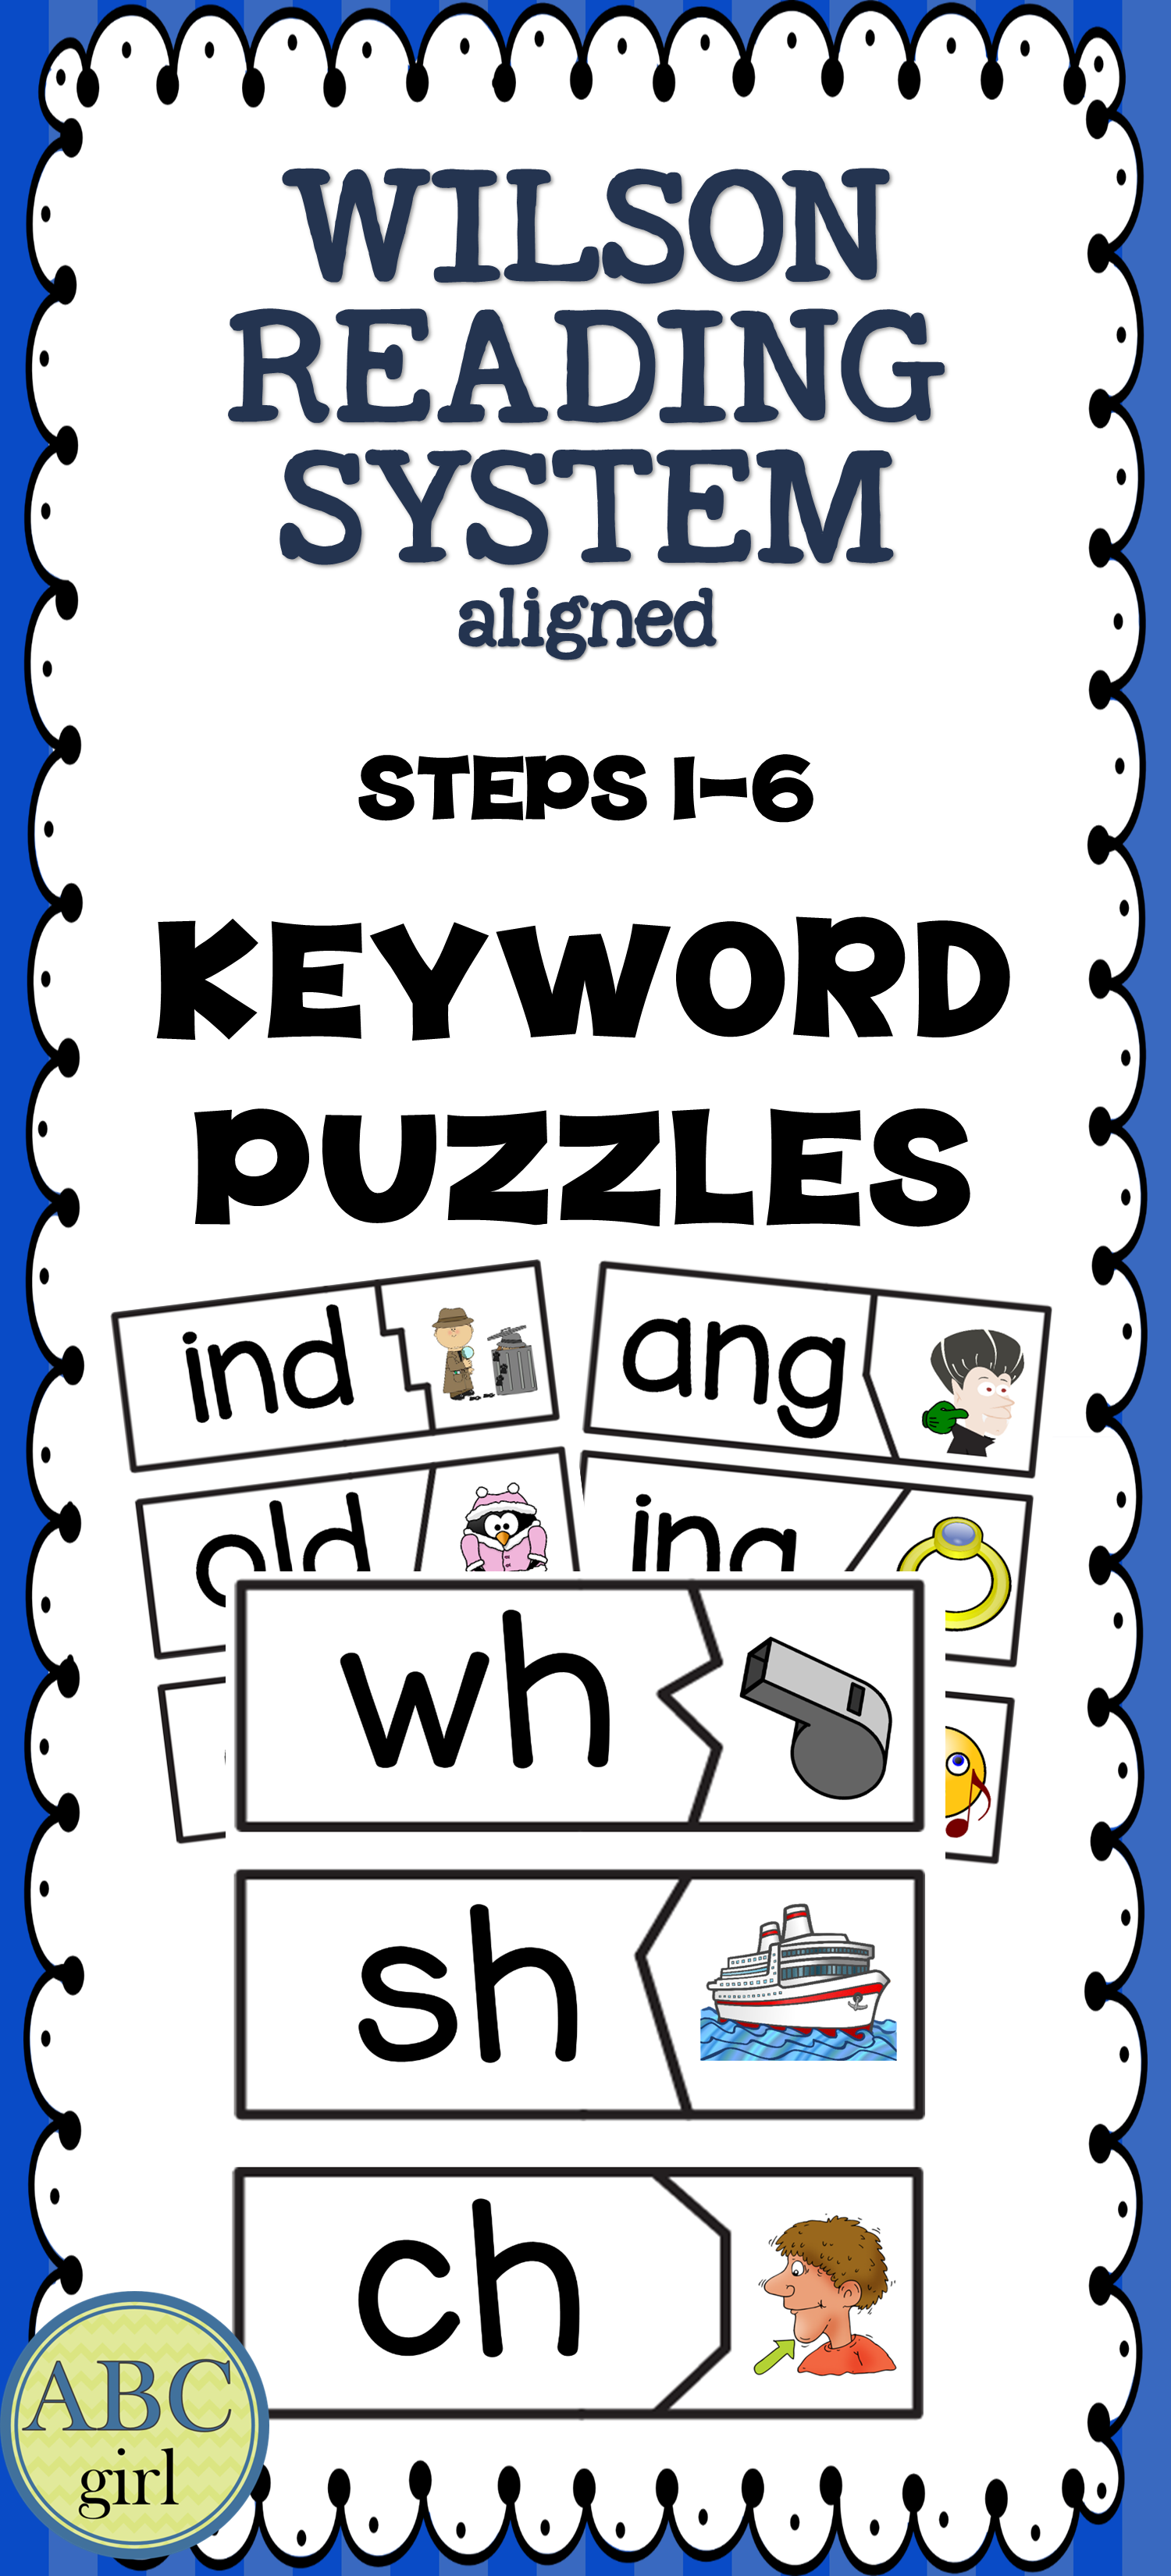 hight resolution of Wilson Reading System® Aligned Keyword Puzzles Steps 1-6.  #wilsonreadingsystem #fundations #wilsonr…   Wilson reading system